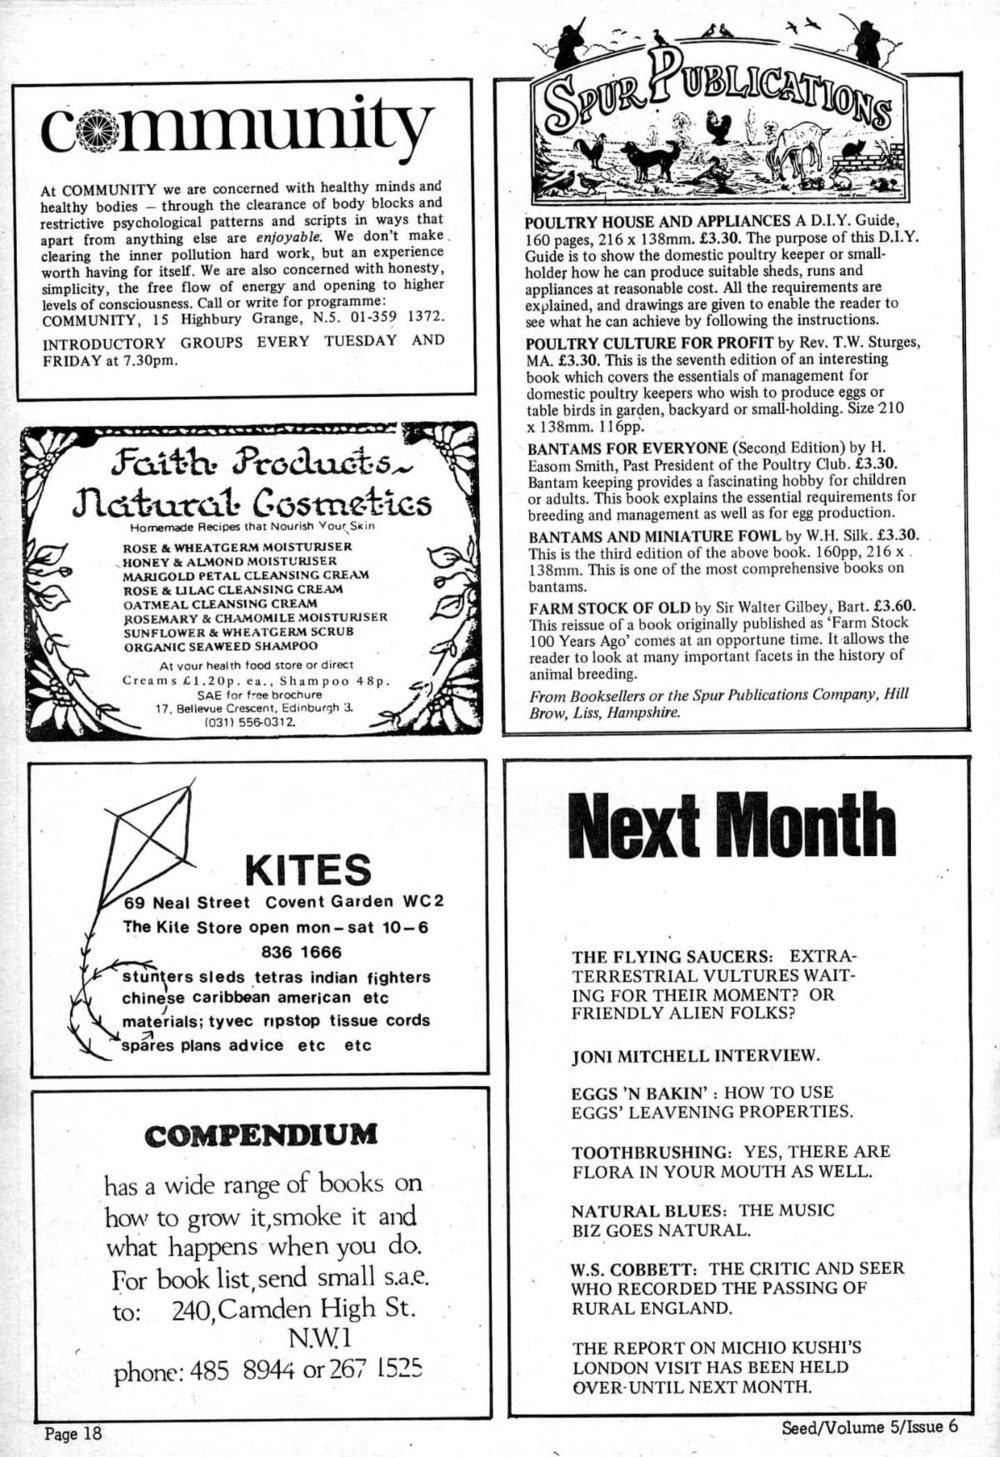 seed-v5-n6-june1976-20.jpg